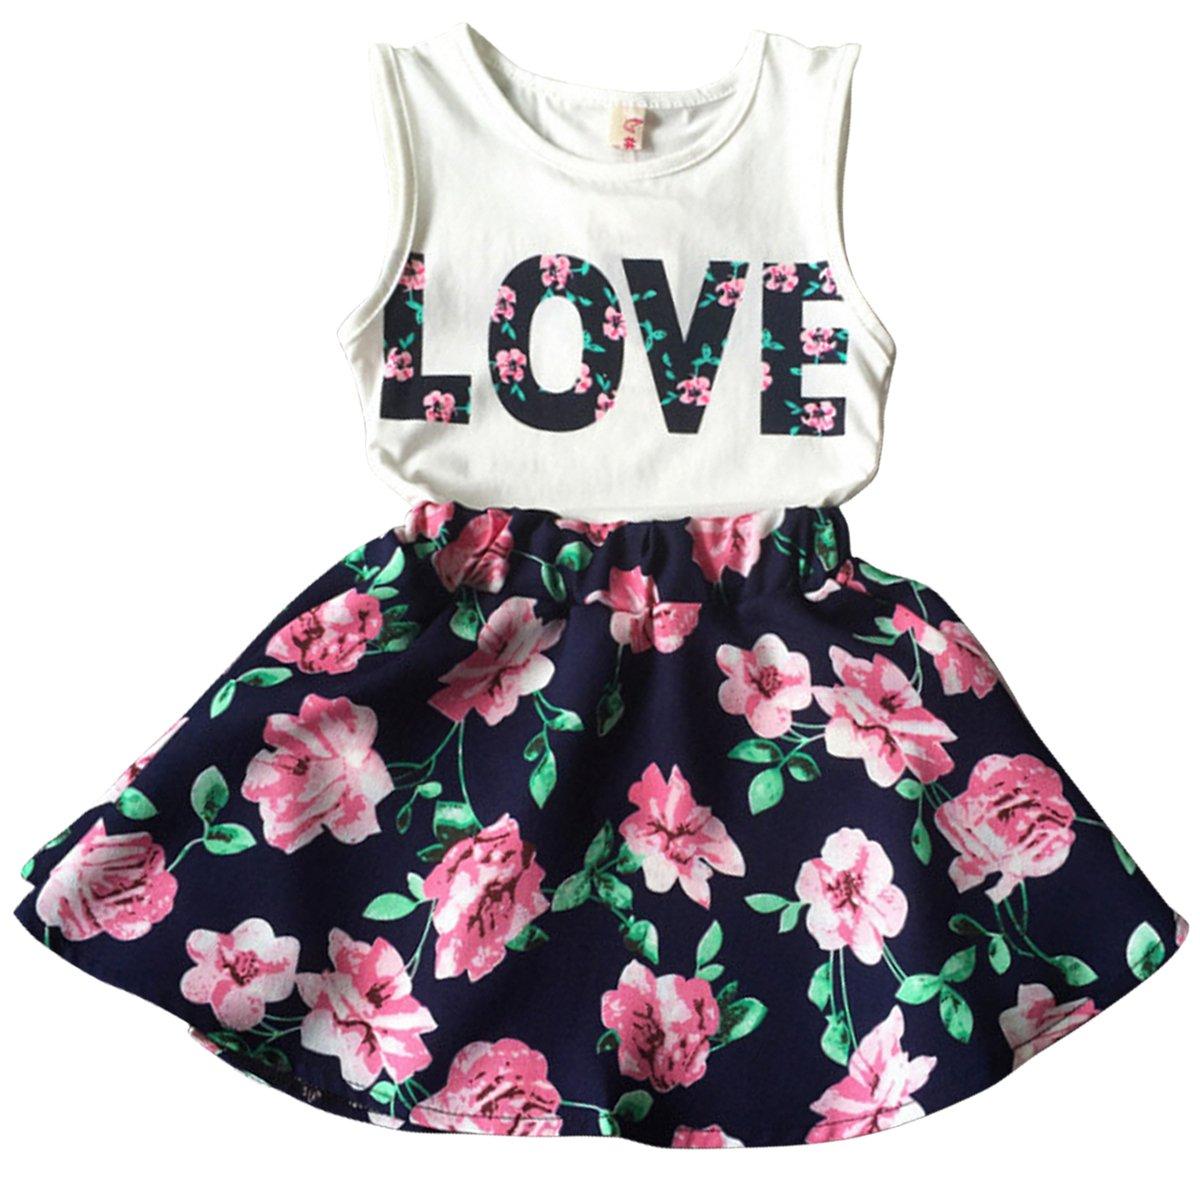 Jastore® Girls Letter Love Flower Clothing Sets Top+Short Skirt Kids Clothes